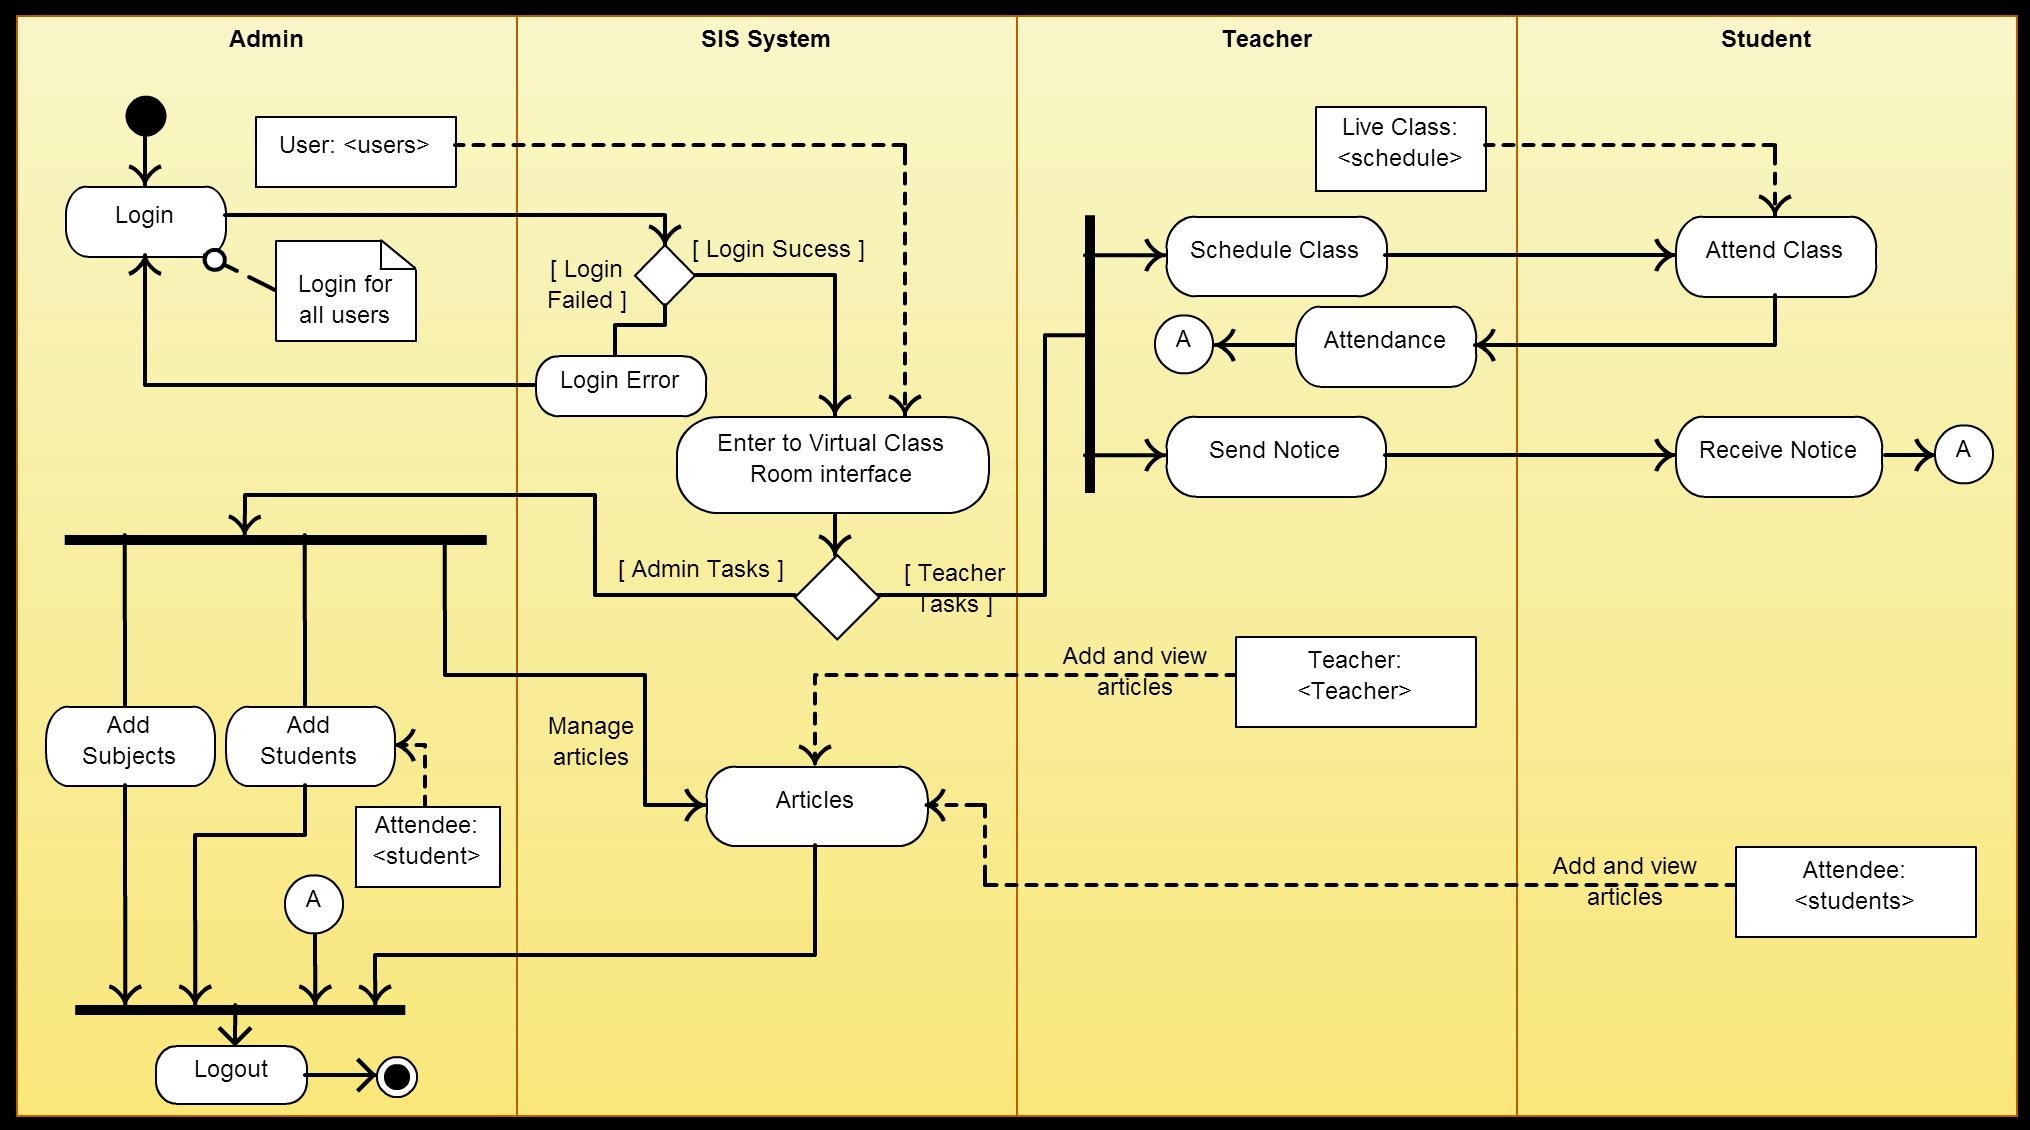 Pin By Dico Brosco On Uml  Activity Diagram In 2019